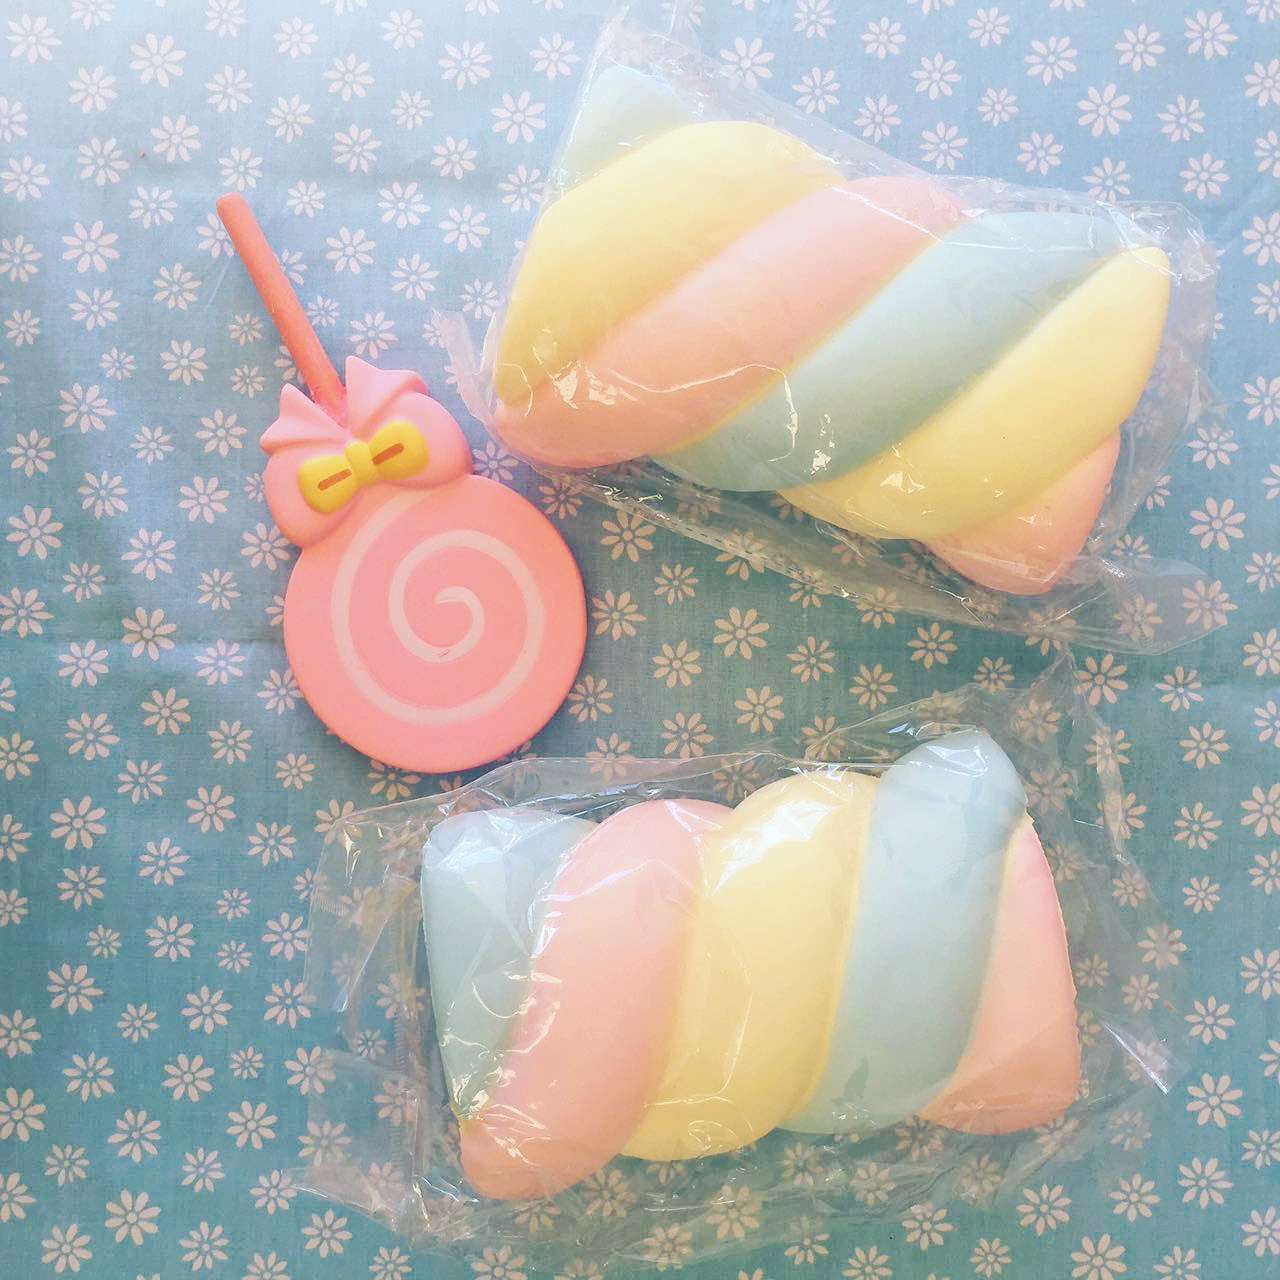 Squishy De Lish Jumbo : Super soft jumbo rainbow marshmallow squishy